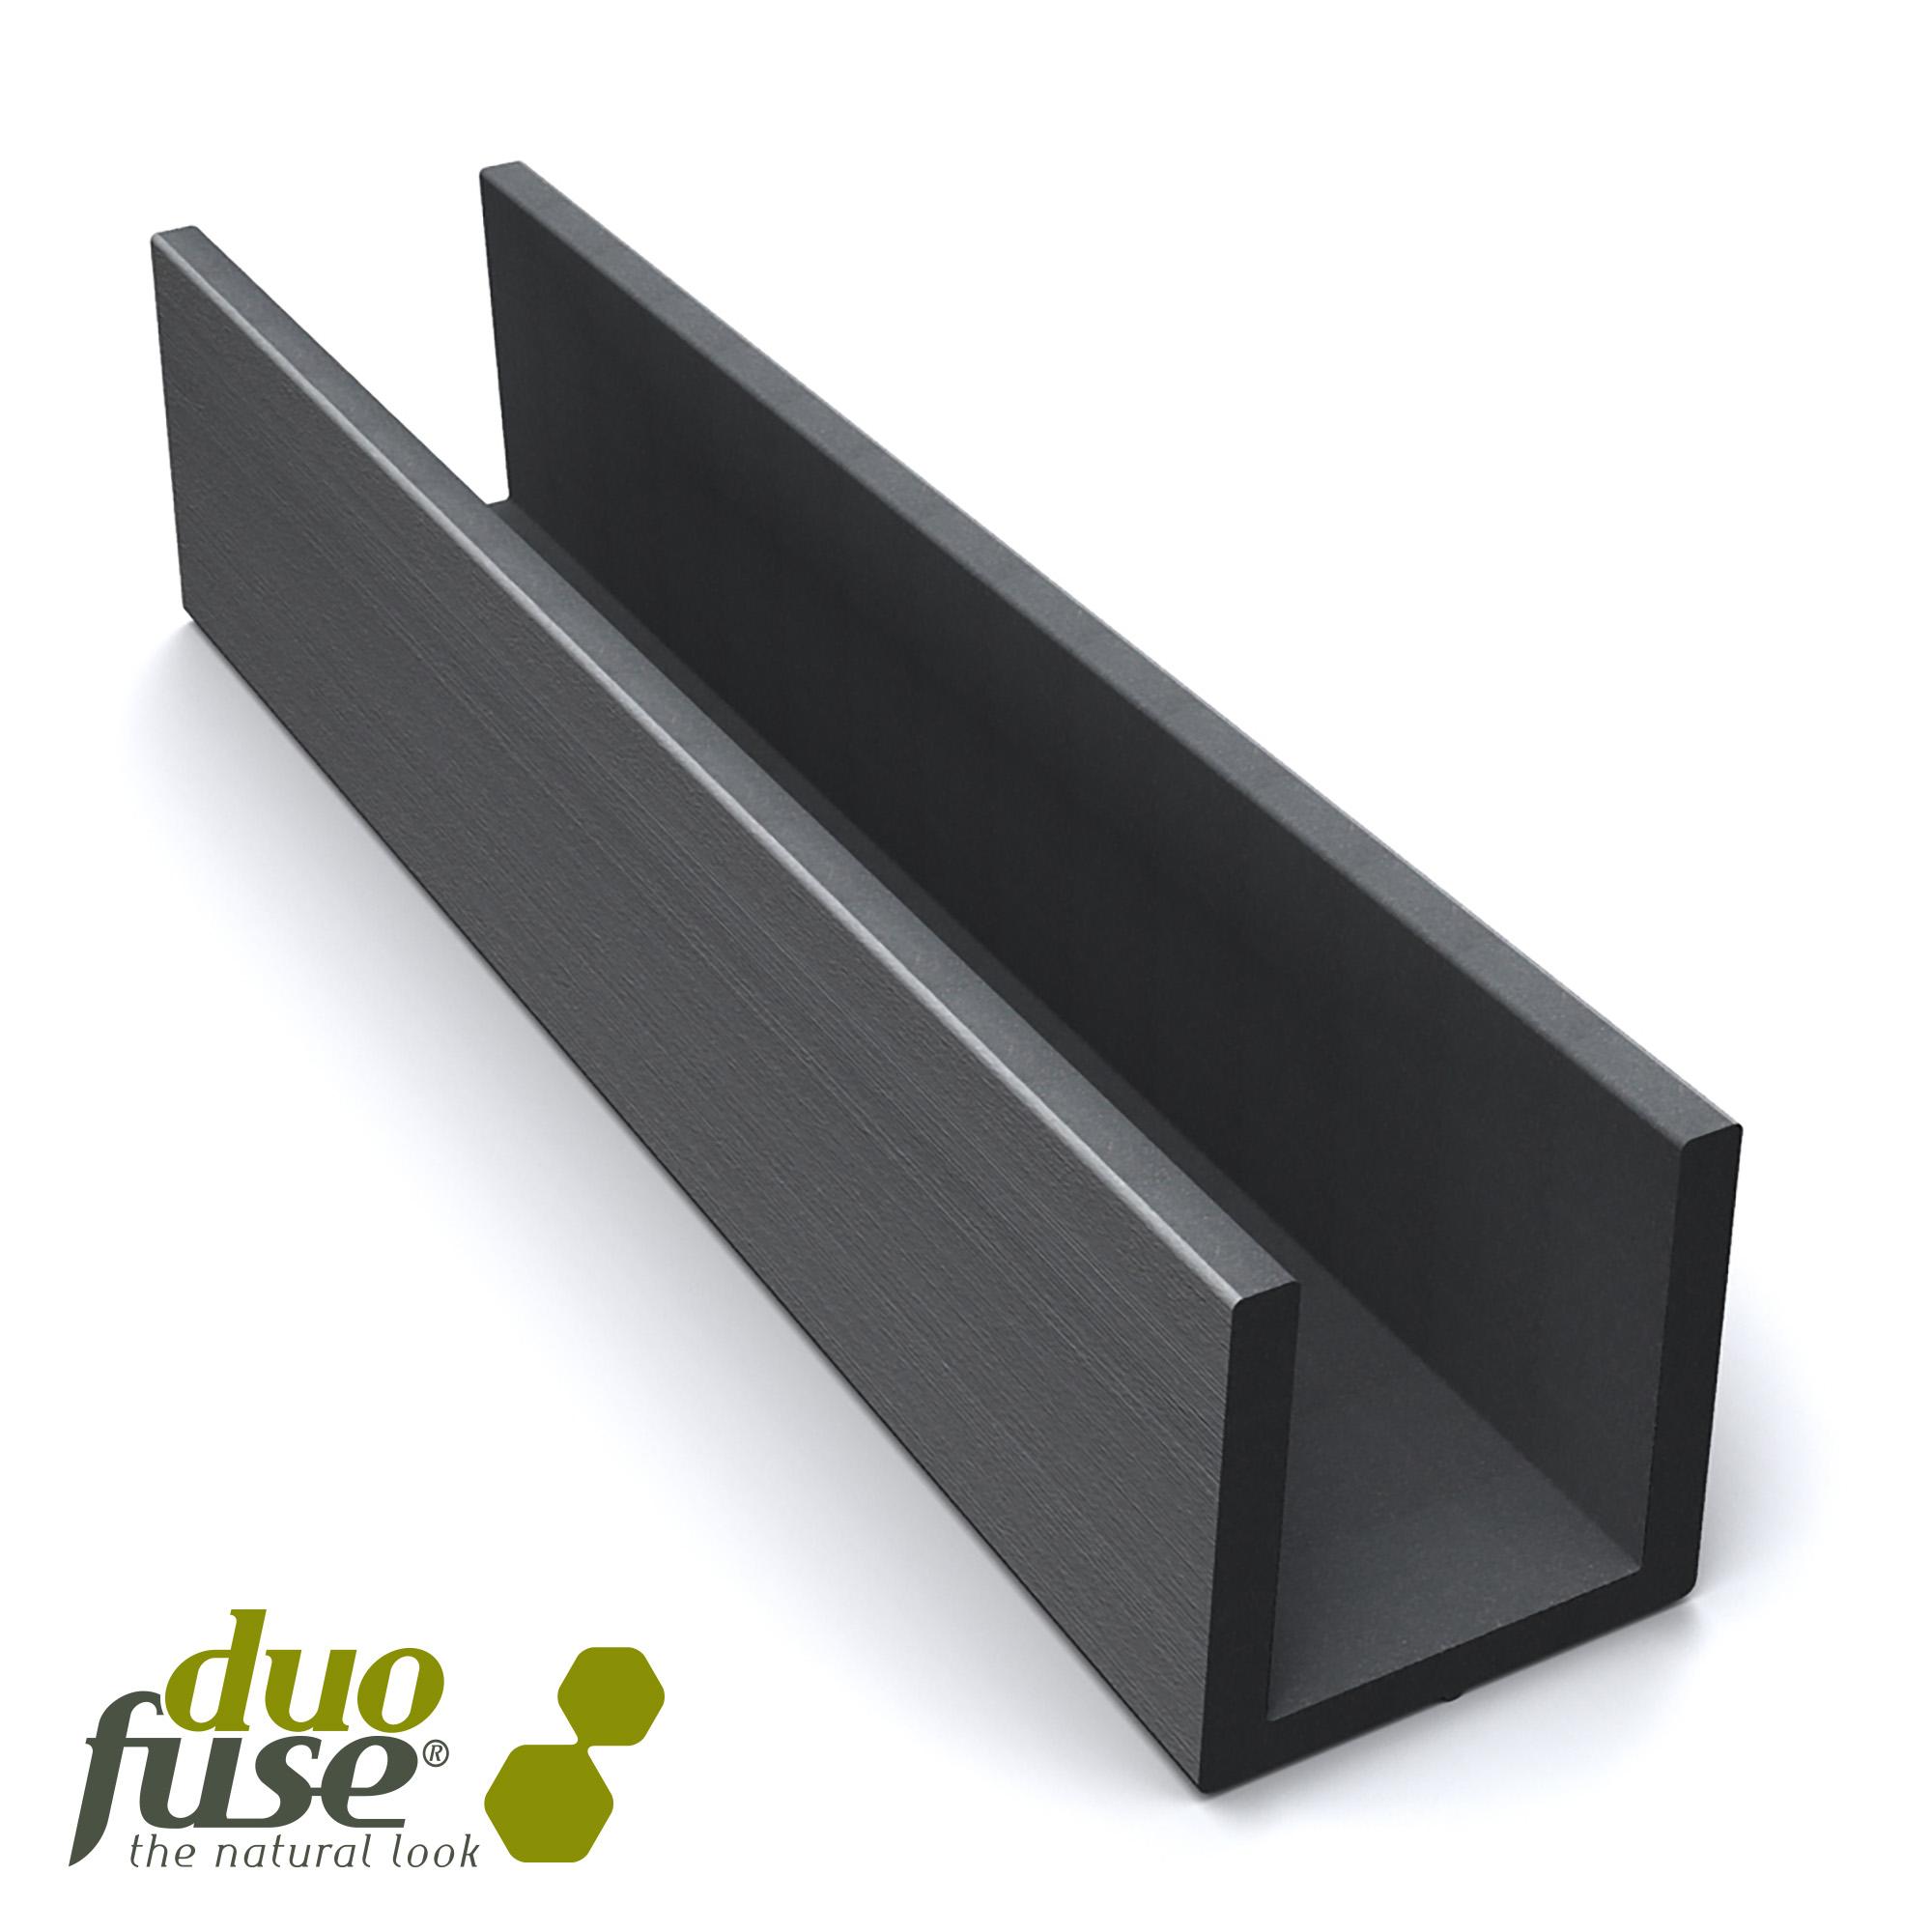 Duofuse | Groot U-profiel tbv betonplaat 4,2 x 3,5 | 182 cm | Stone Grey